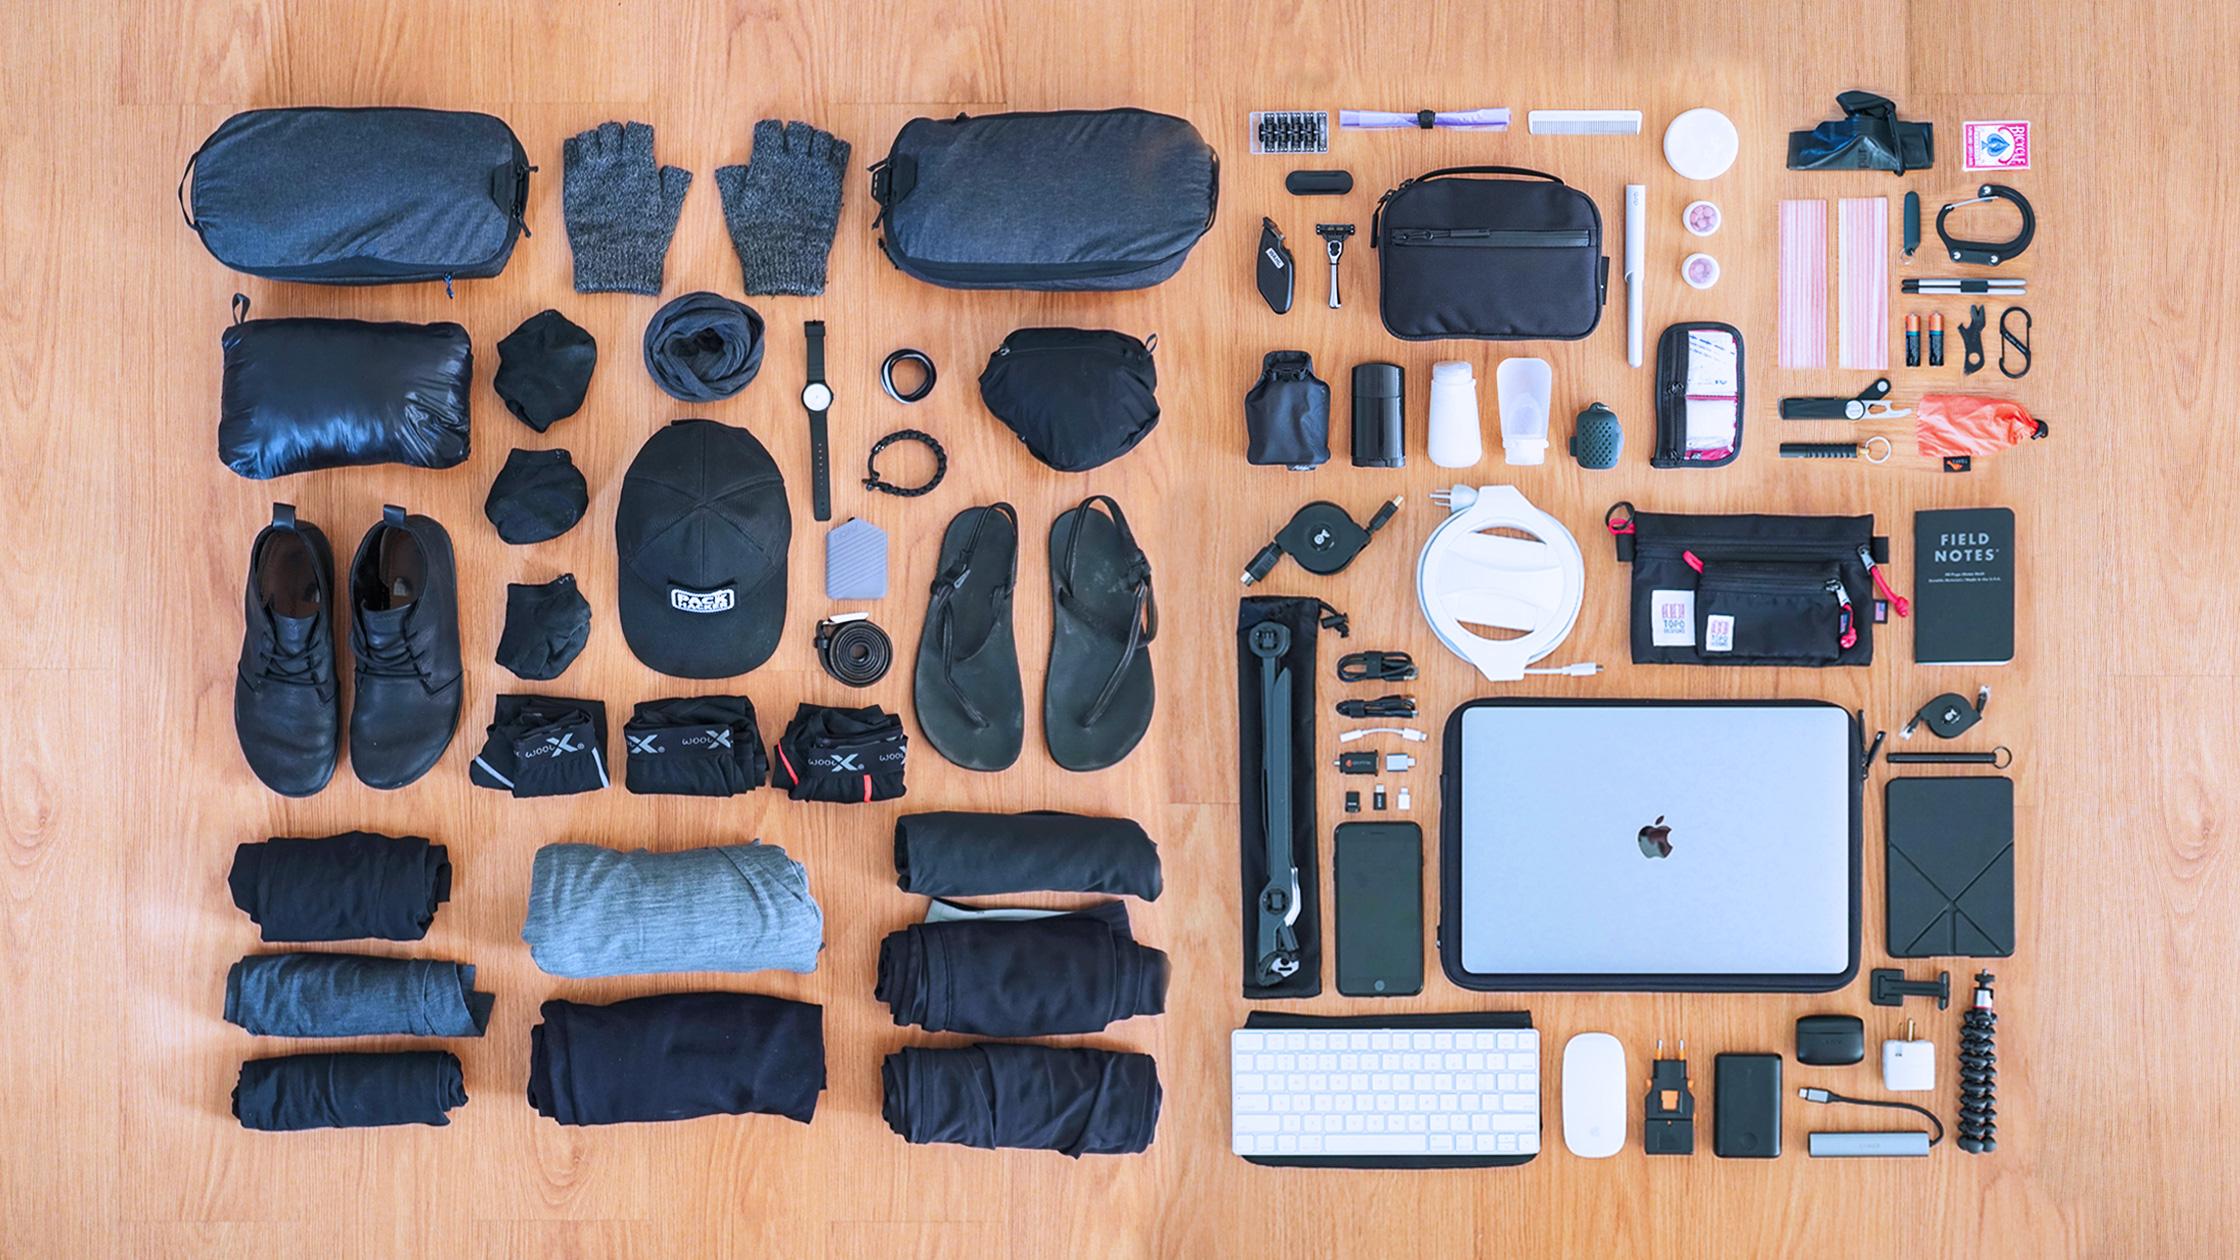 guión cortar Novia  81 Items: The Ultimate Digital Nomad Packing List | Pack Hacker